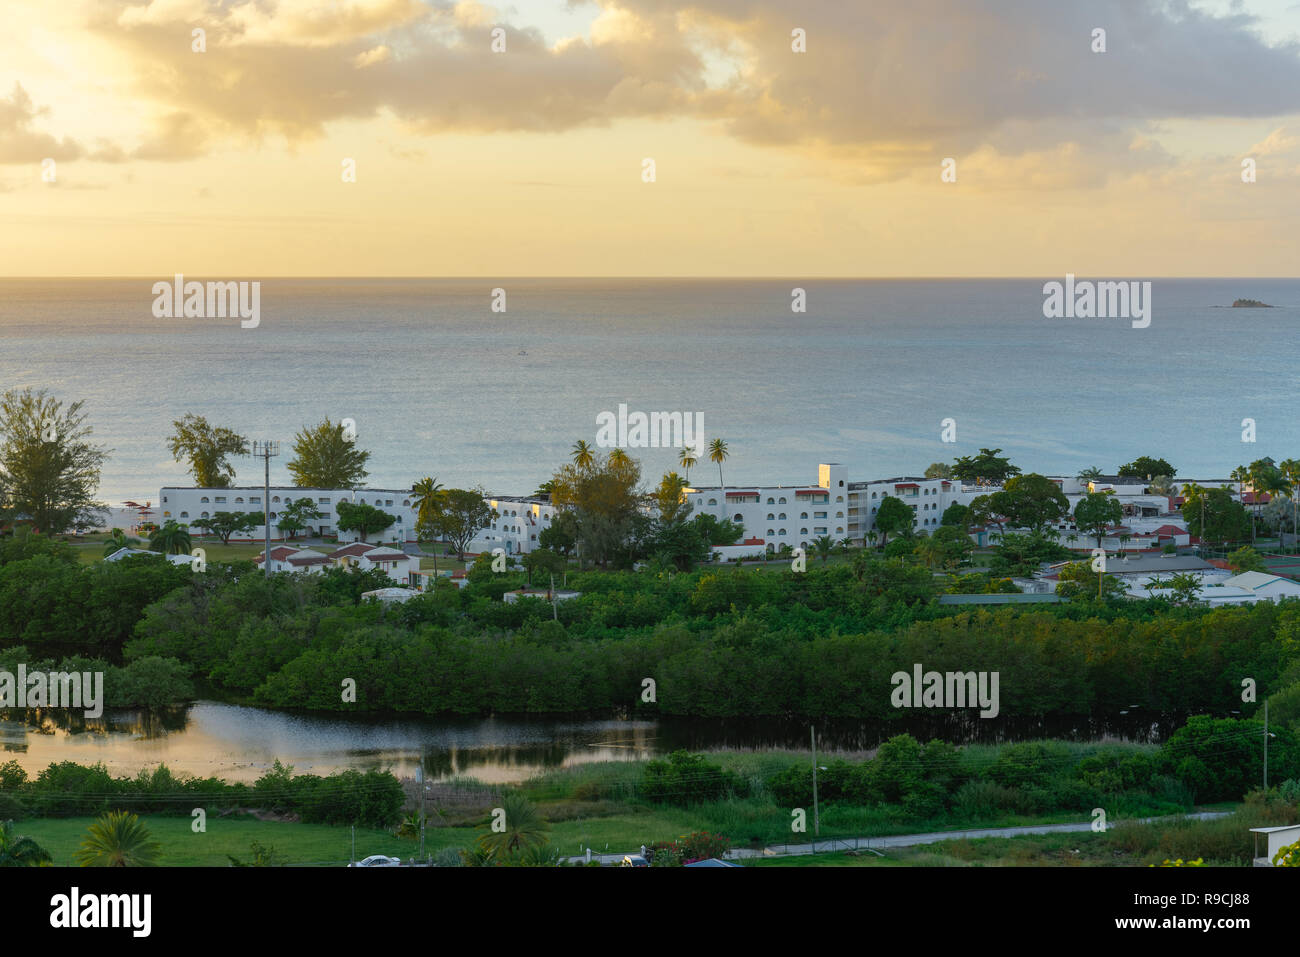 Jolly Beach Resort at sunset in Antigua. - Stock Image